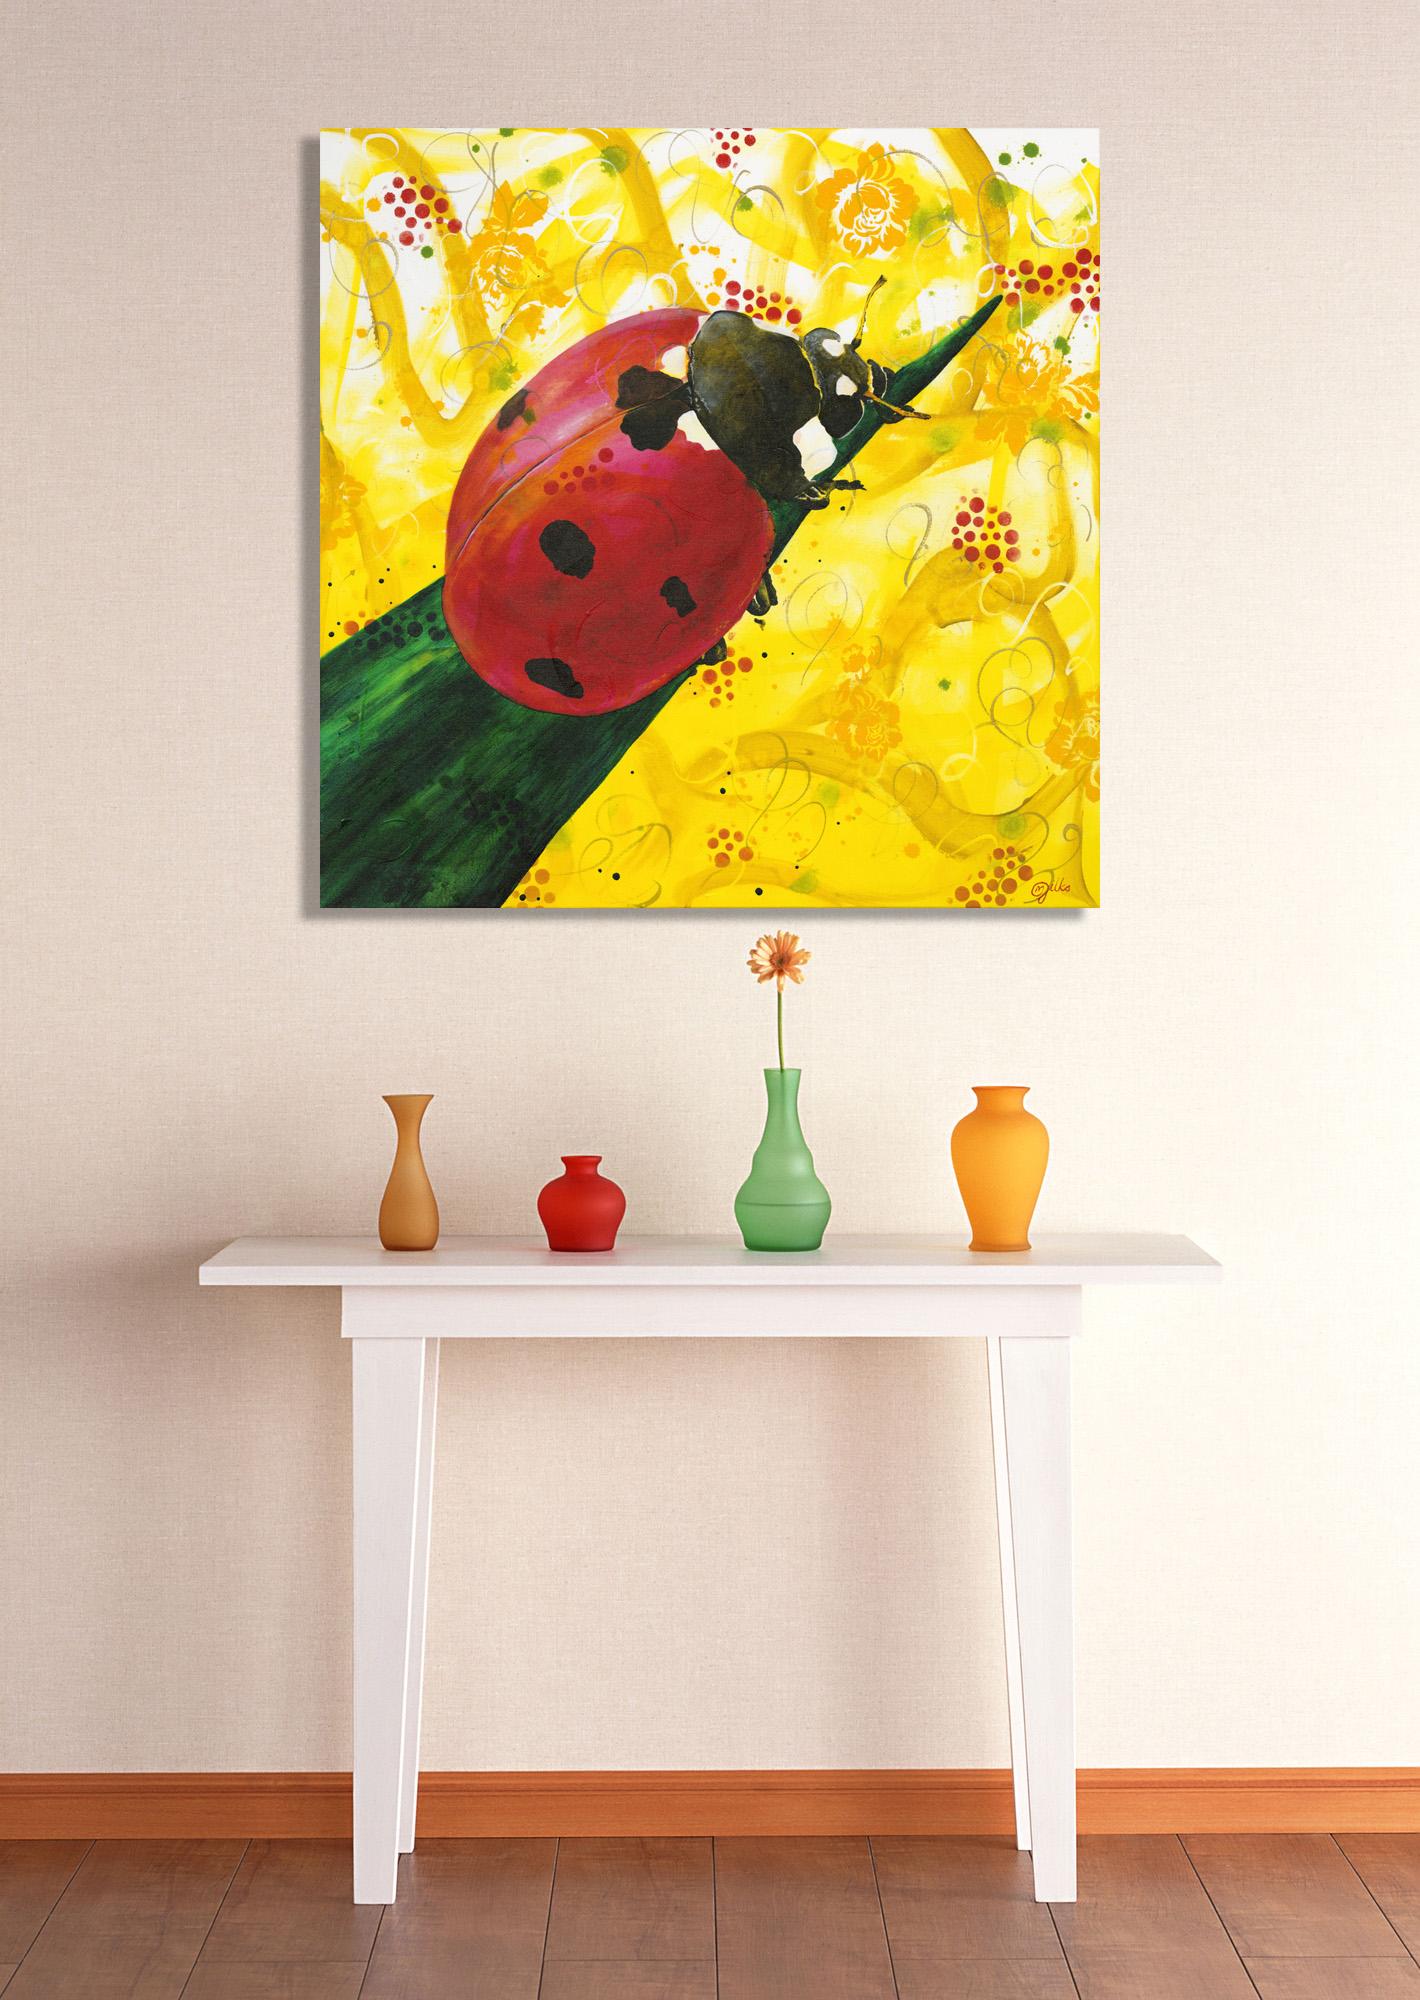 ladybug-in-room